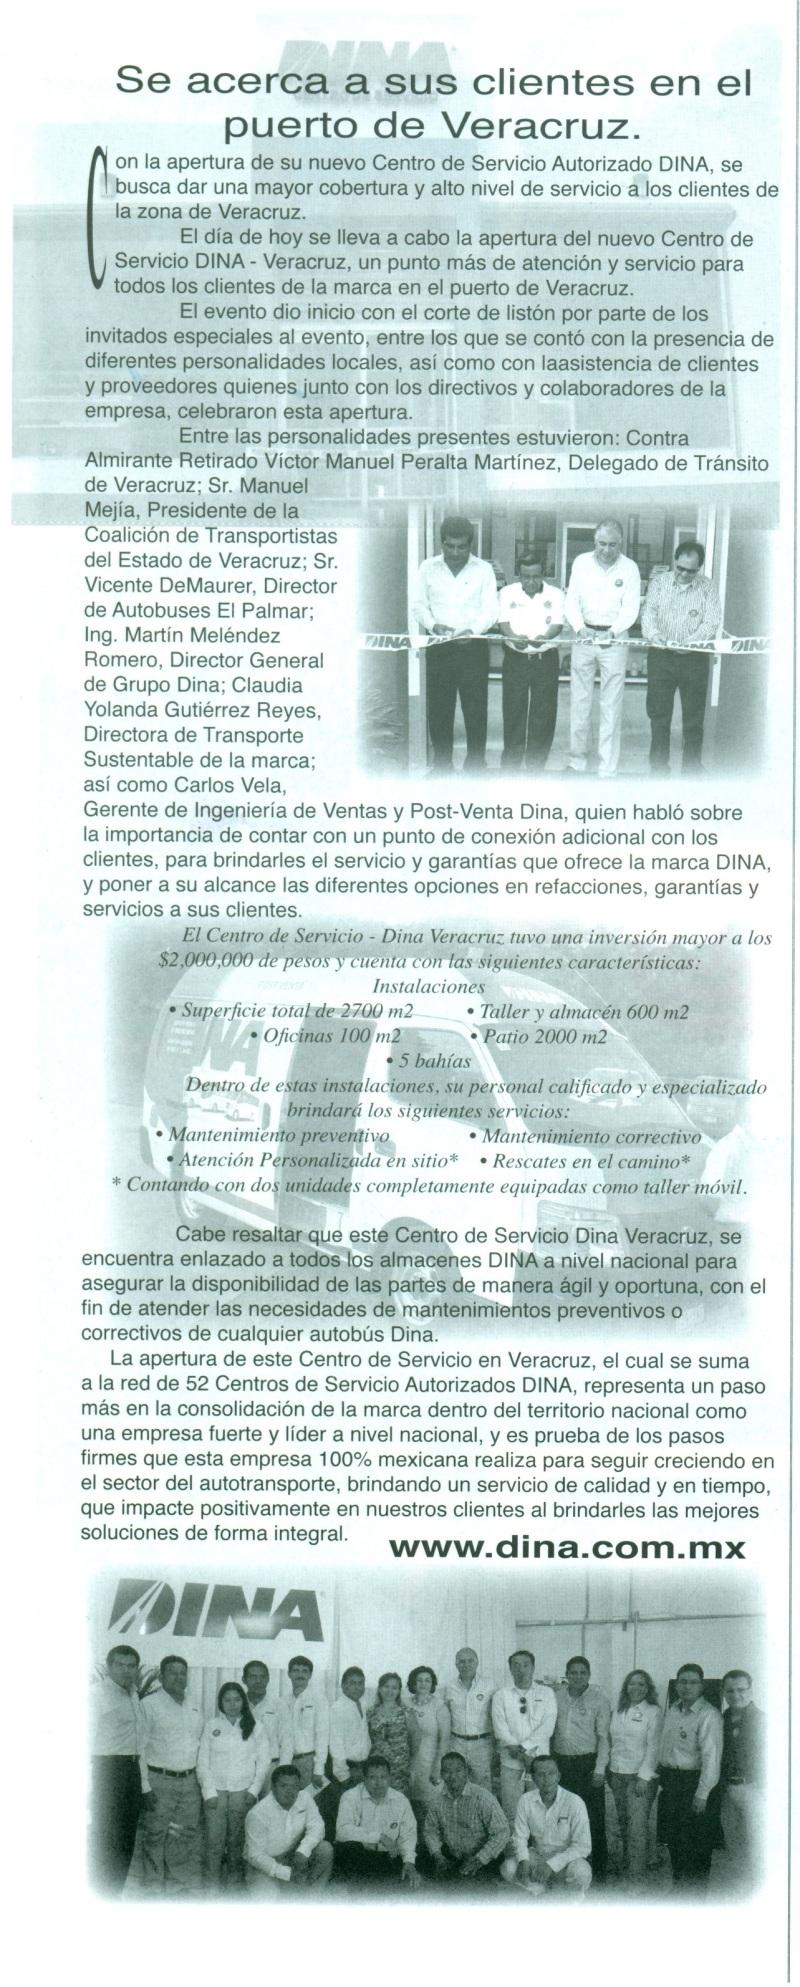 Revista %22Mundo Empresarial Octubre 2013 Pag. 32